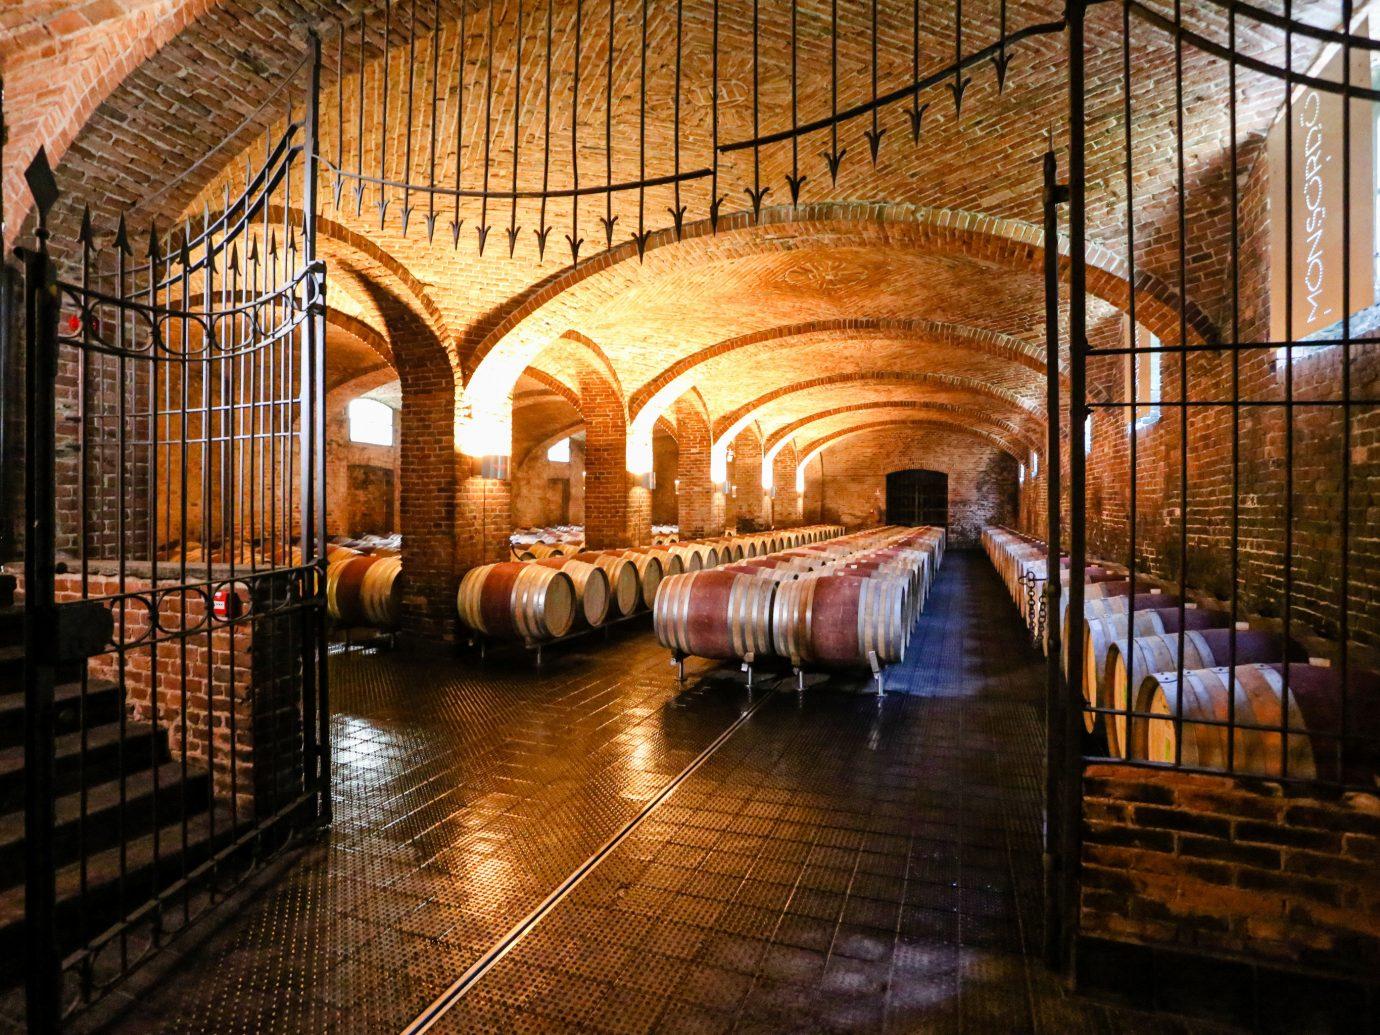 Food + Drink Hotels Italy Luxury Travel Trip Ideas indoor building floor room Winery arch wine cellar night basement area gate